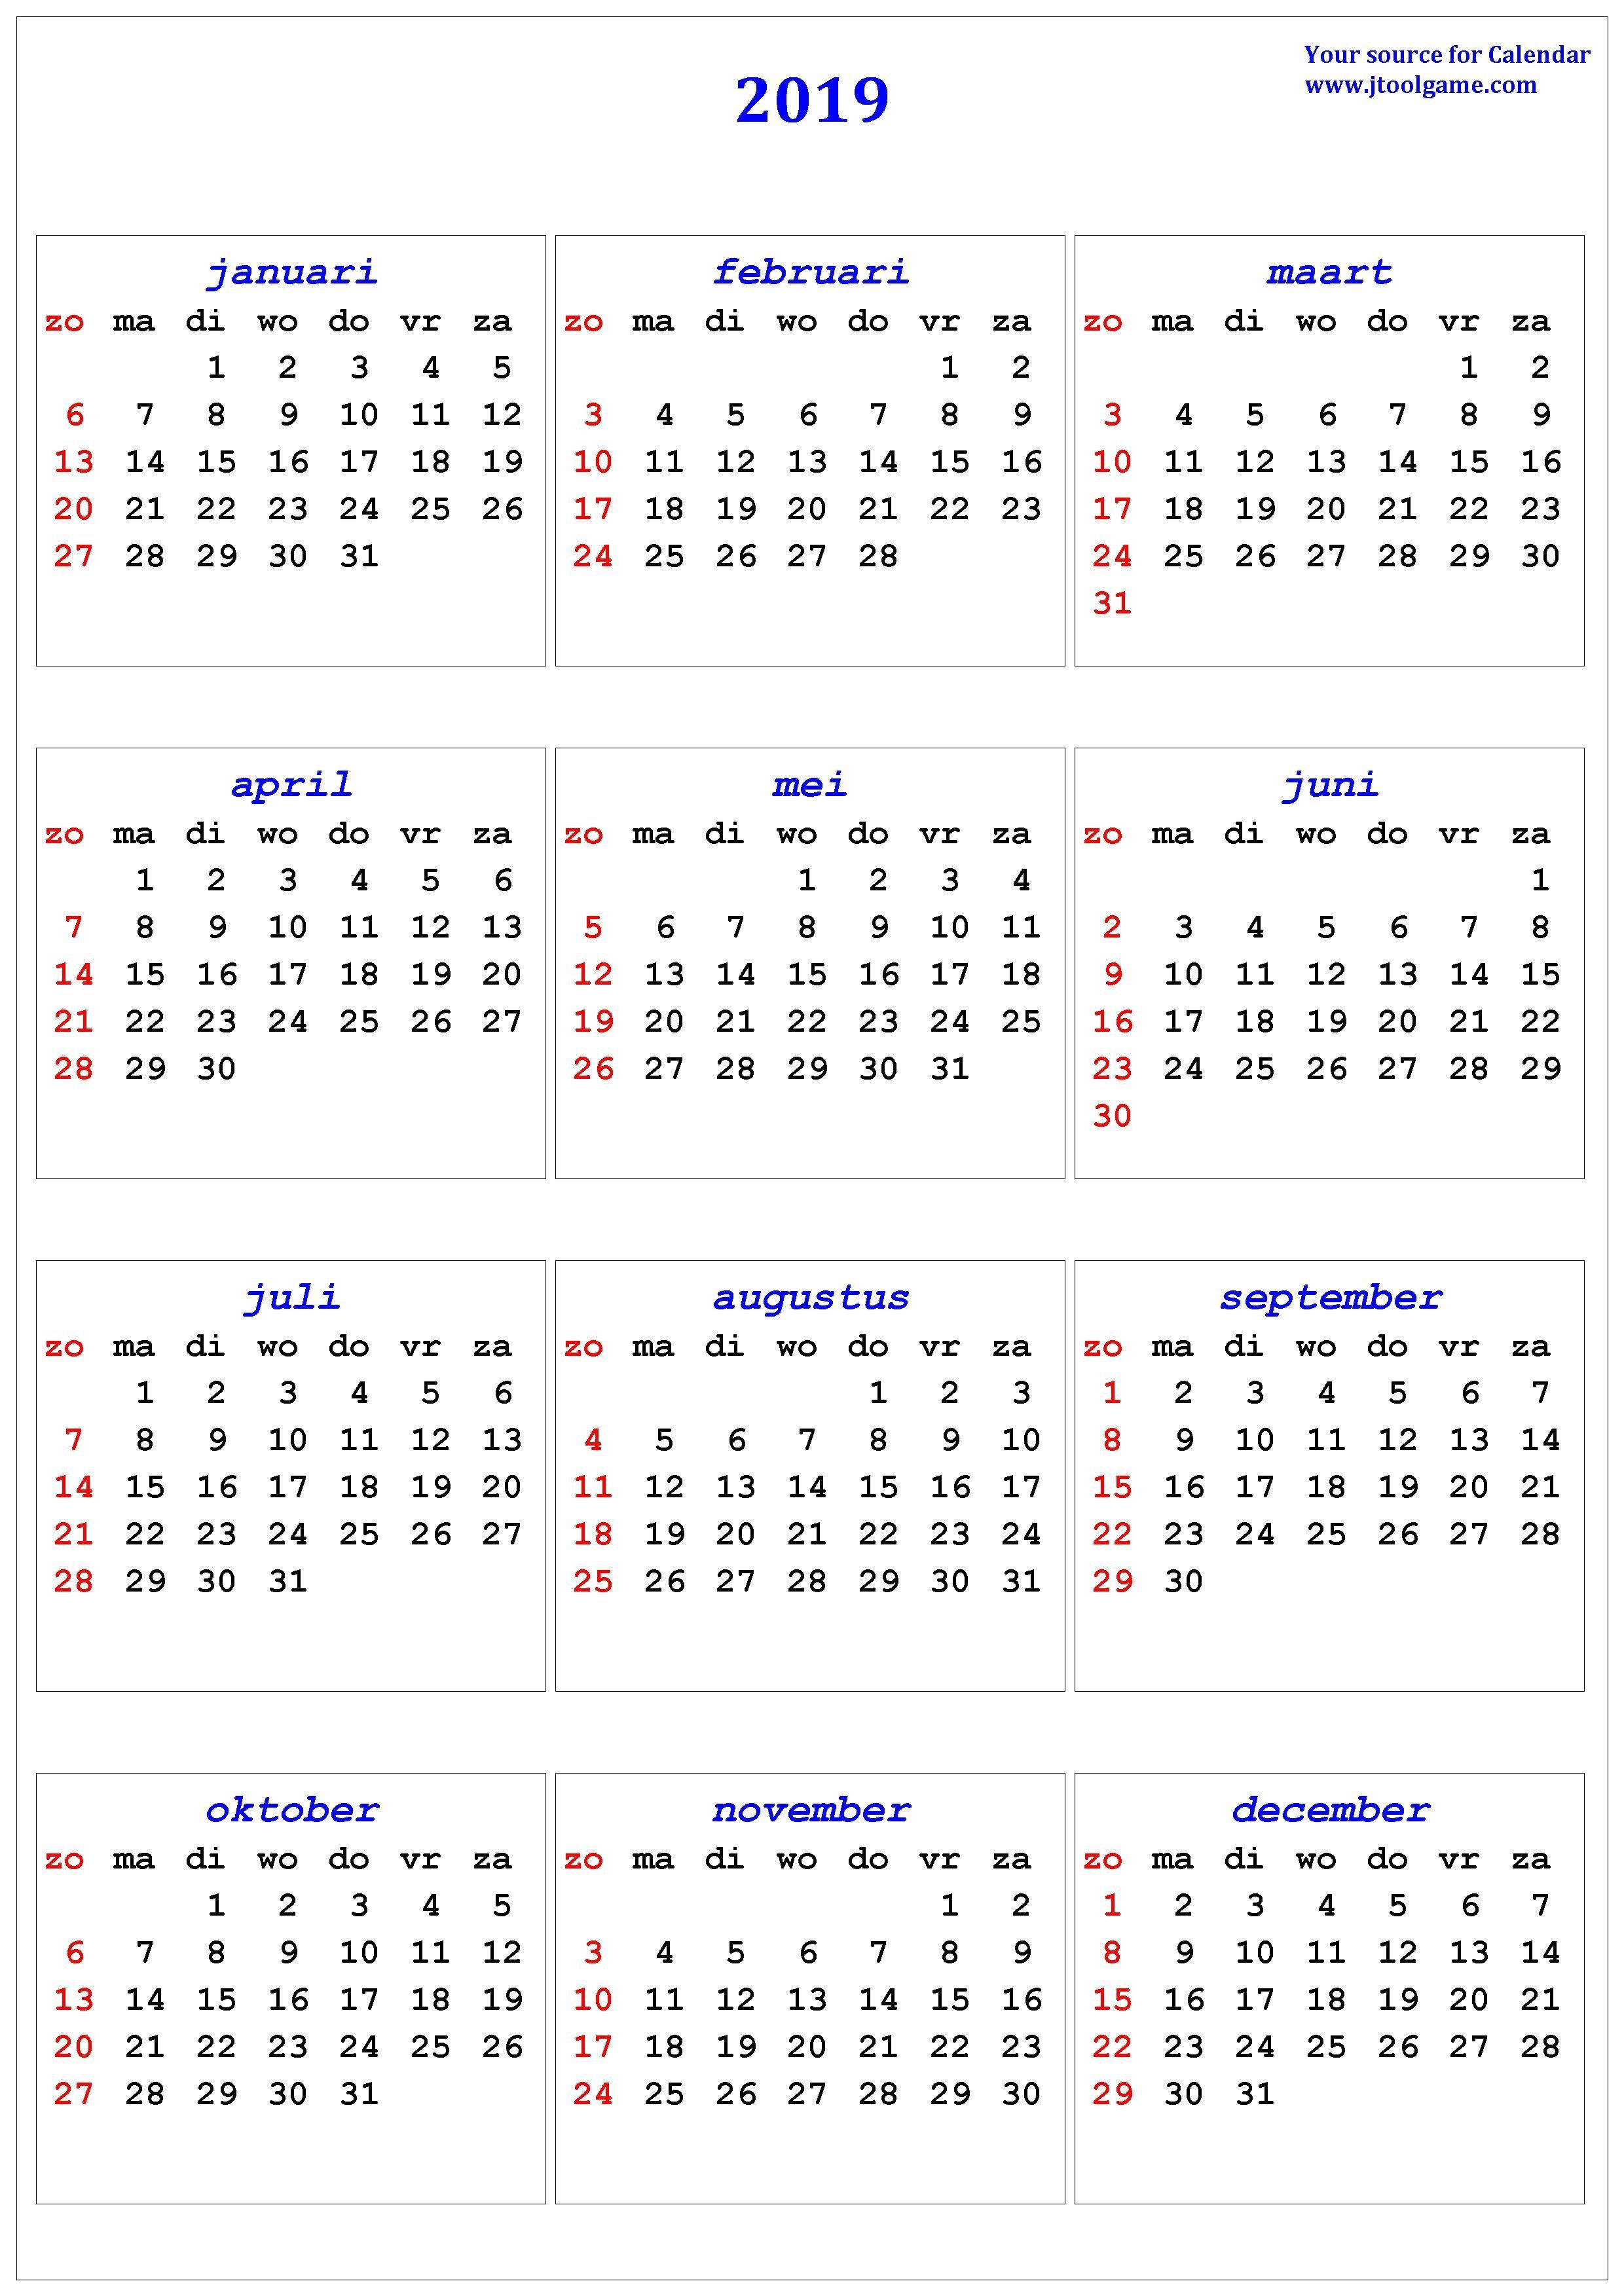 2019 Calendar - Printable Calendar. 2019 Calendar In Multiple Colors Calendar 2019 Za